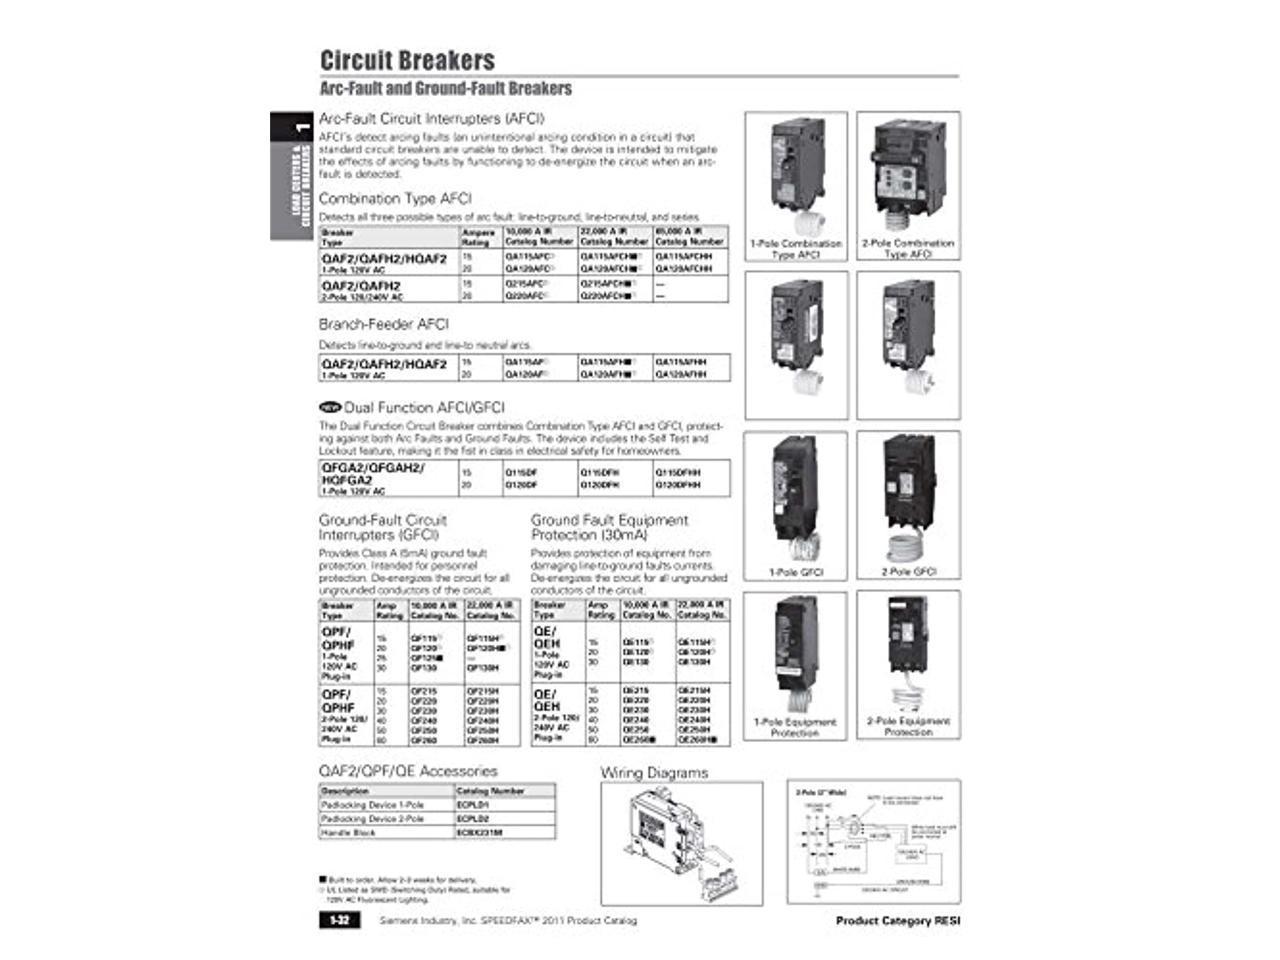 Siemens Q120DF 20-Amp Afci/Gfci Dual Function Circuit